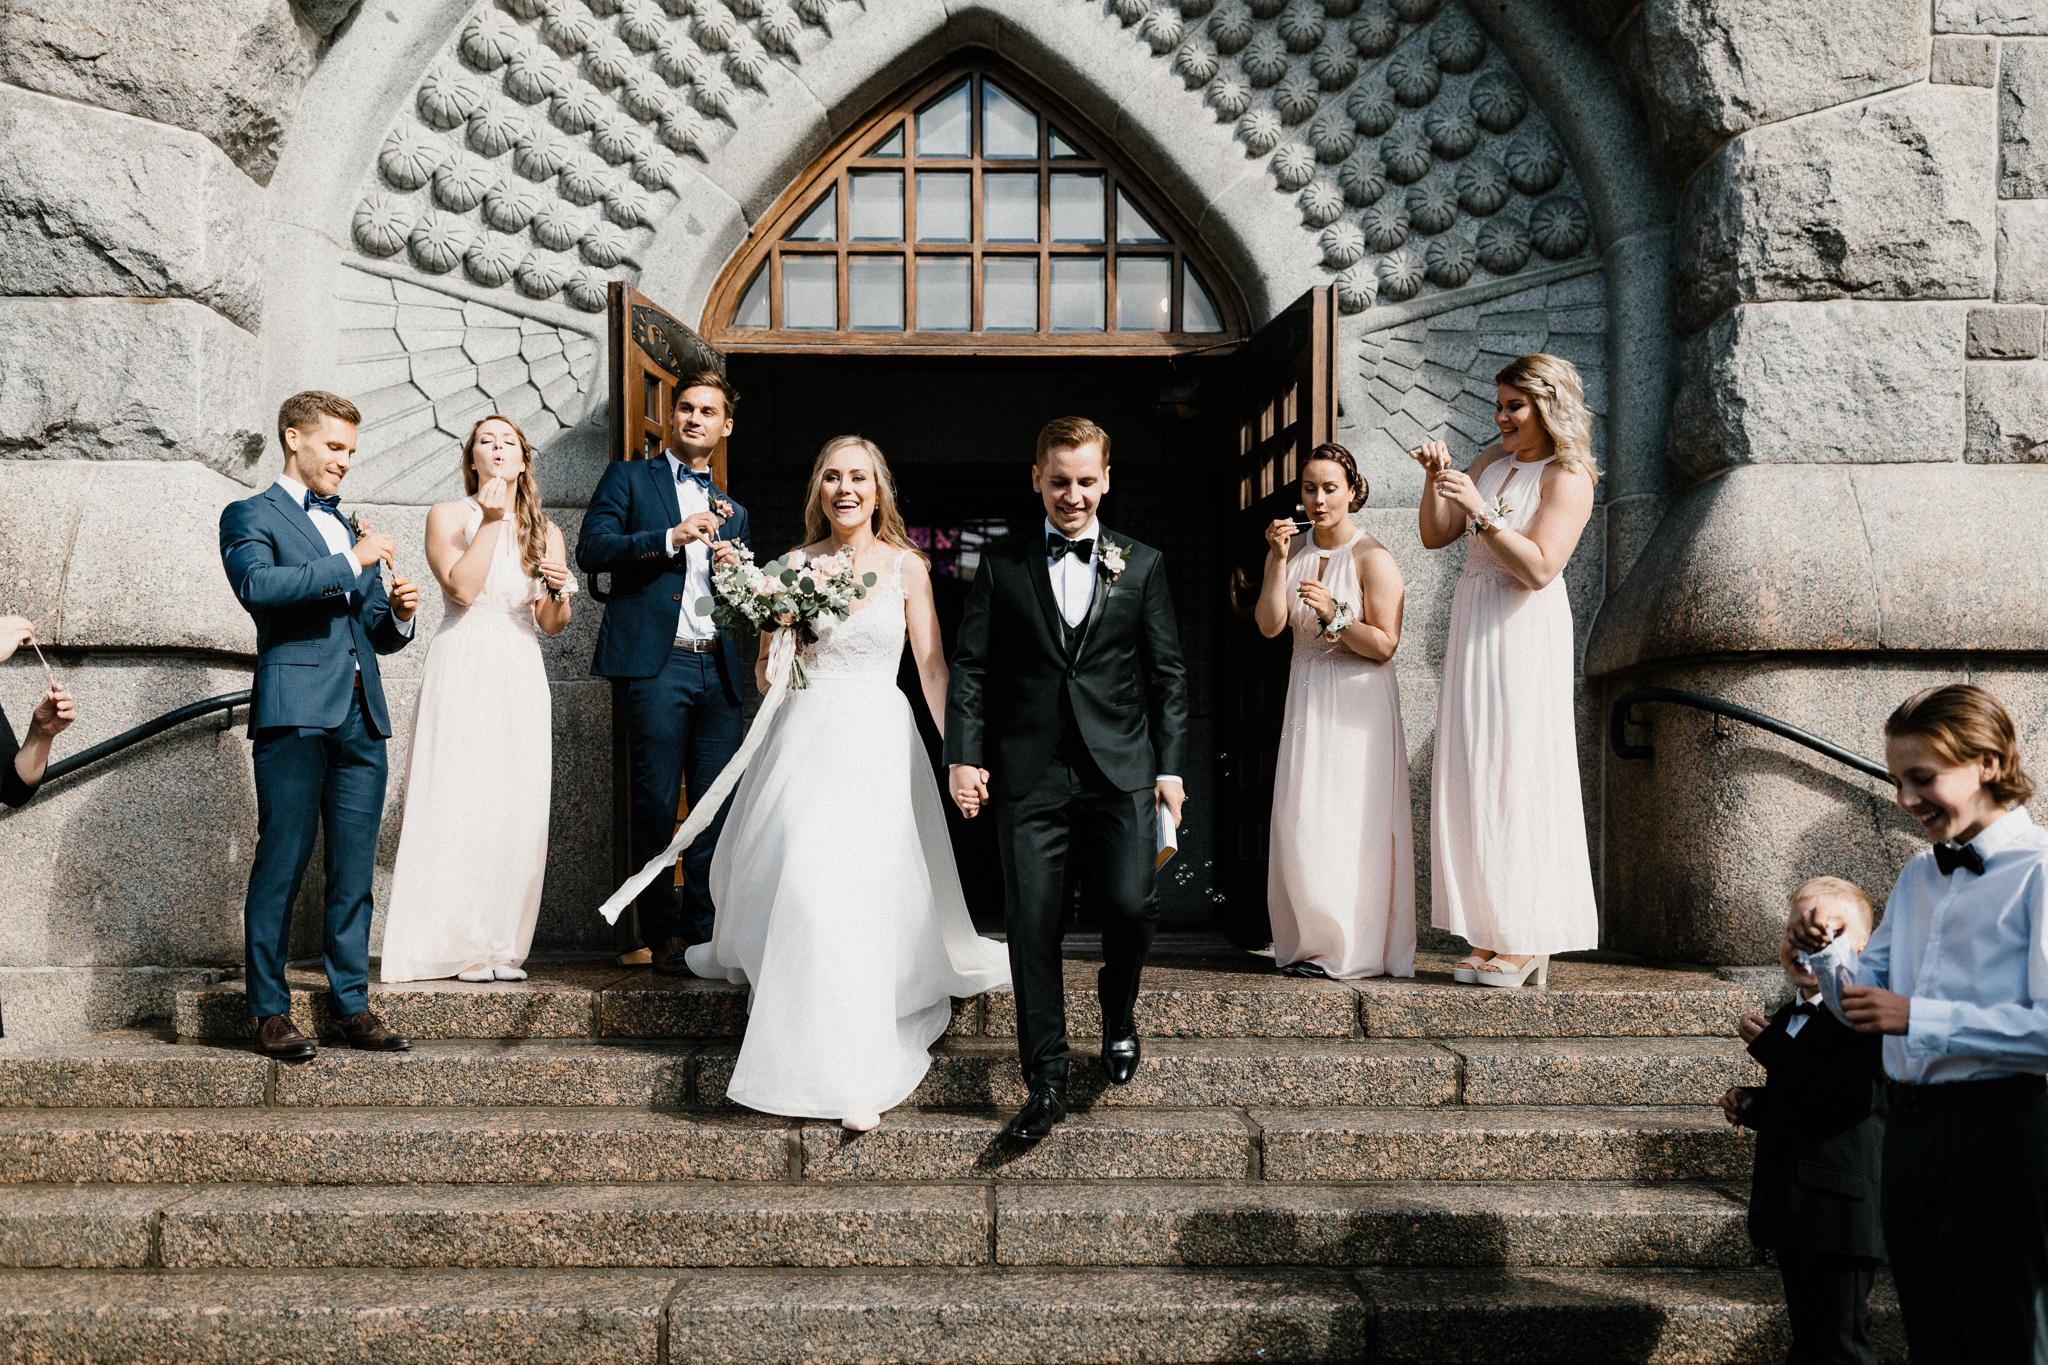 Johanna + Mikko - Tampere - Photo by Patrick Karkkolainen Wedding Photographer-82.jpg